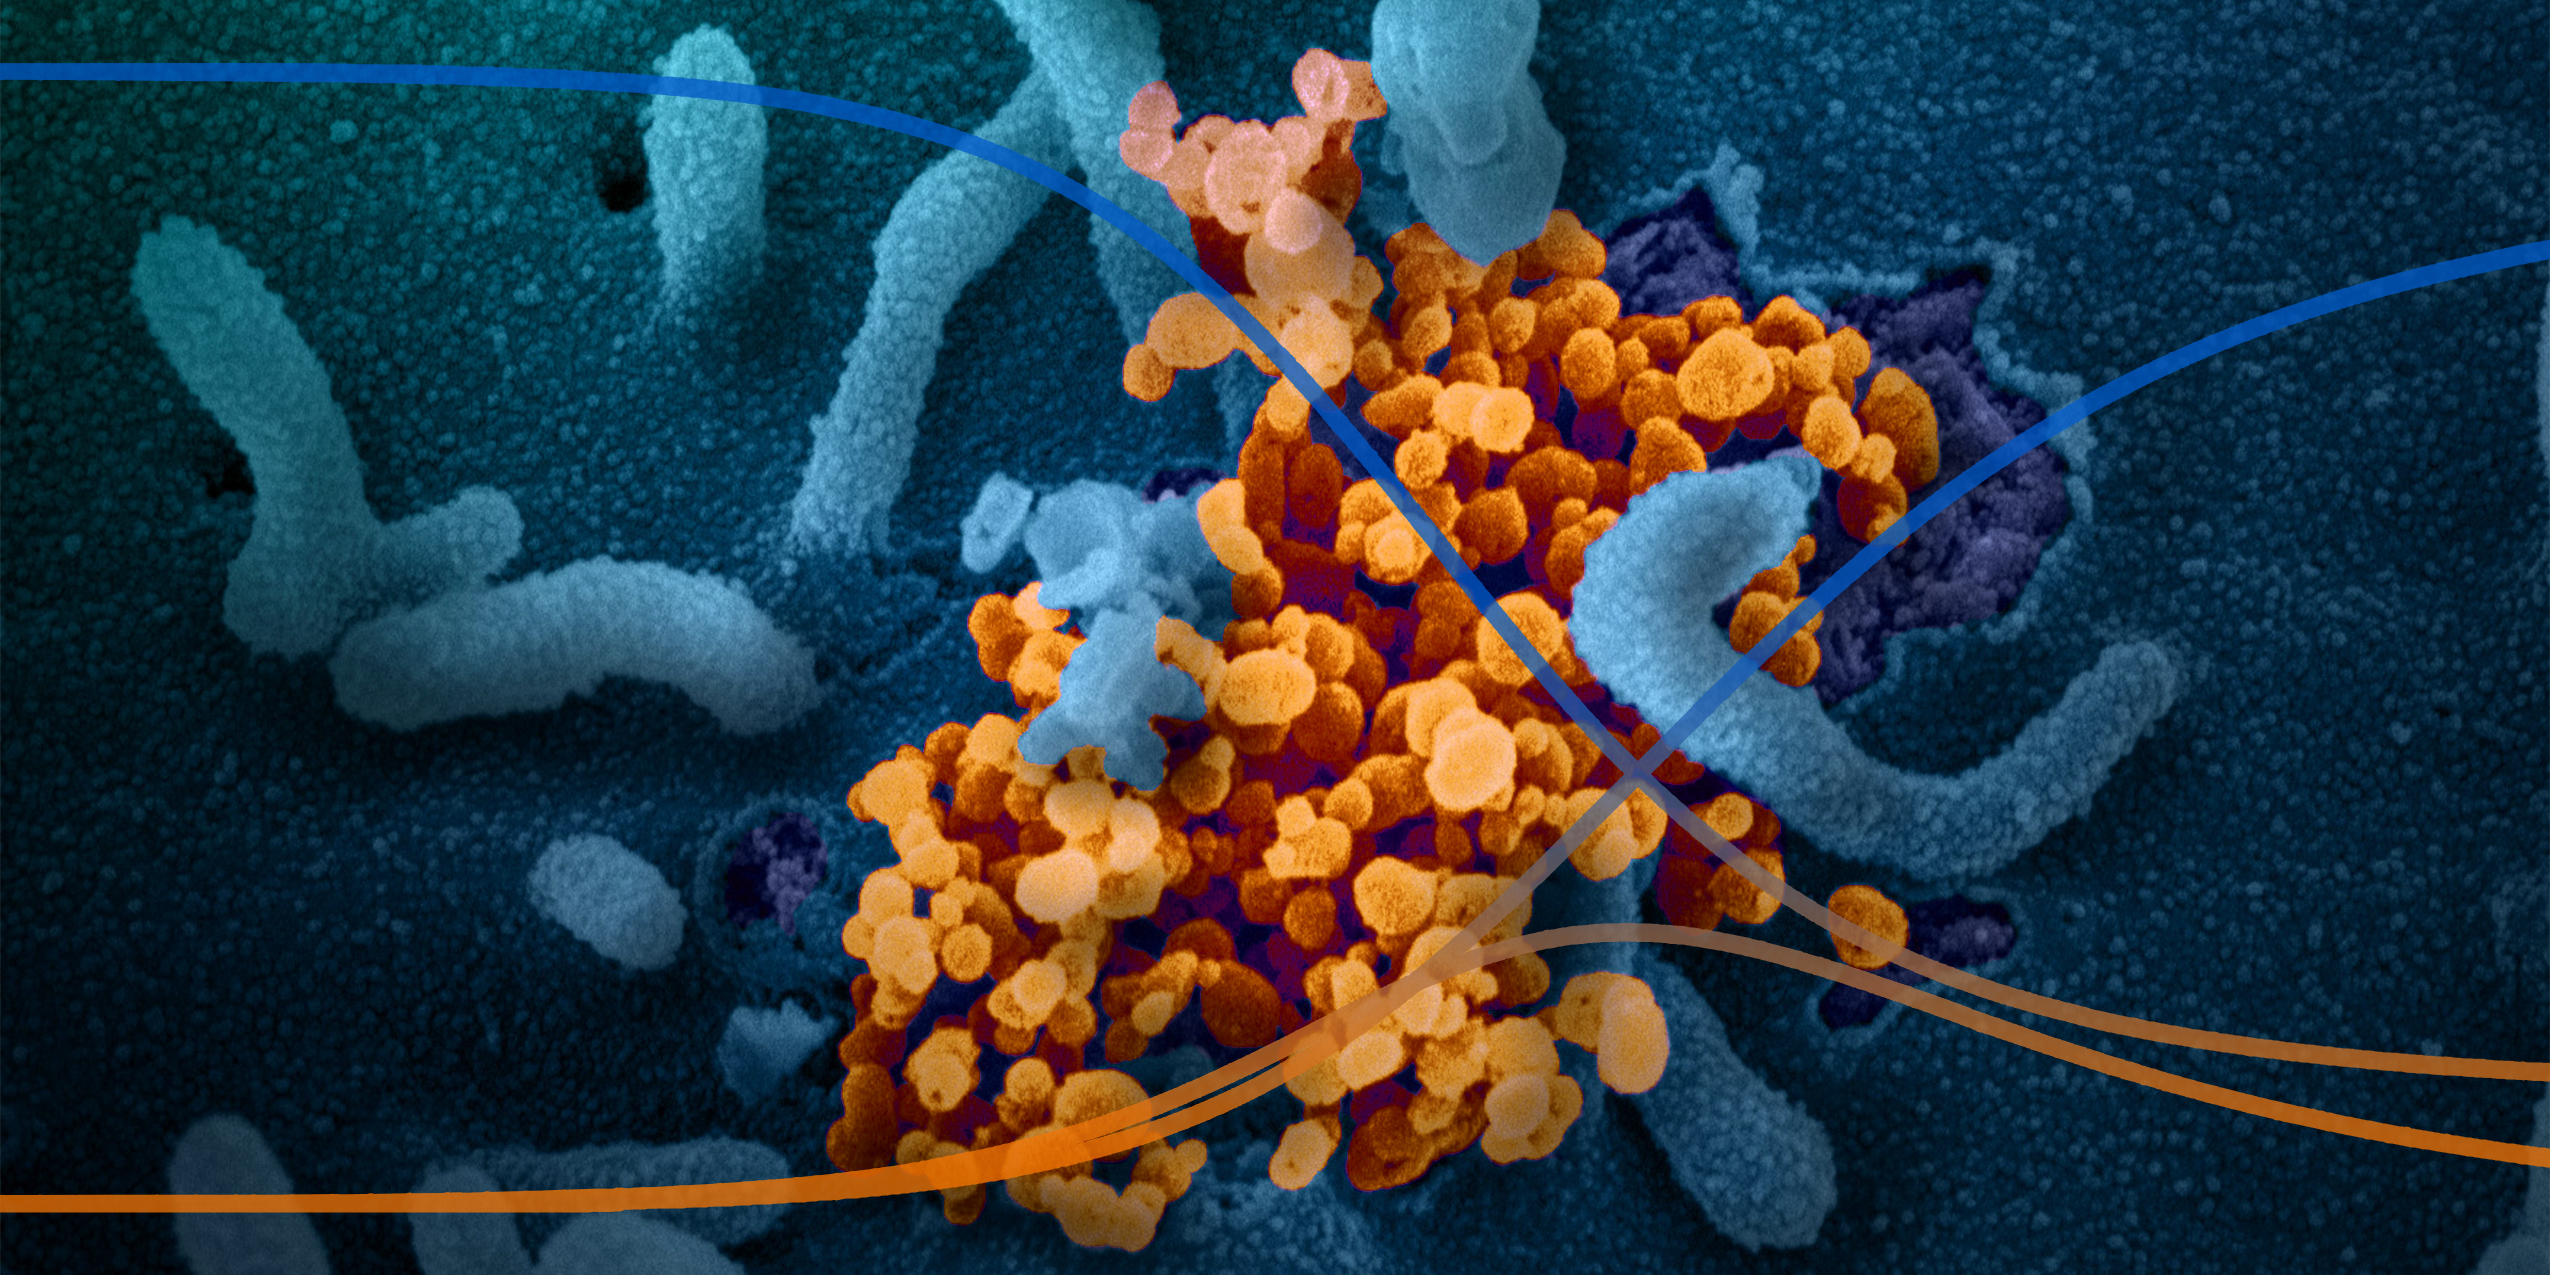 SIR Modeling on Azure: COVID-19 Hospital Impact Model for Epidemics